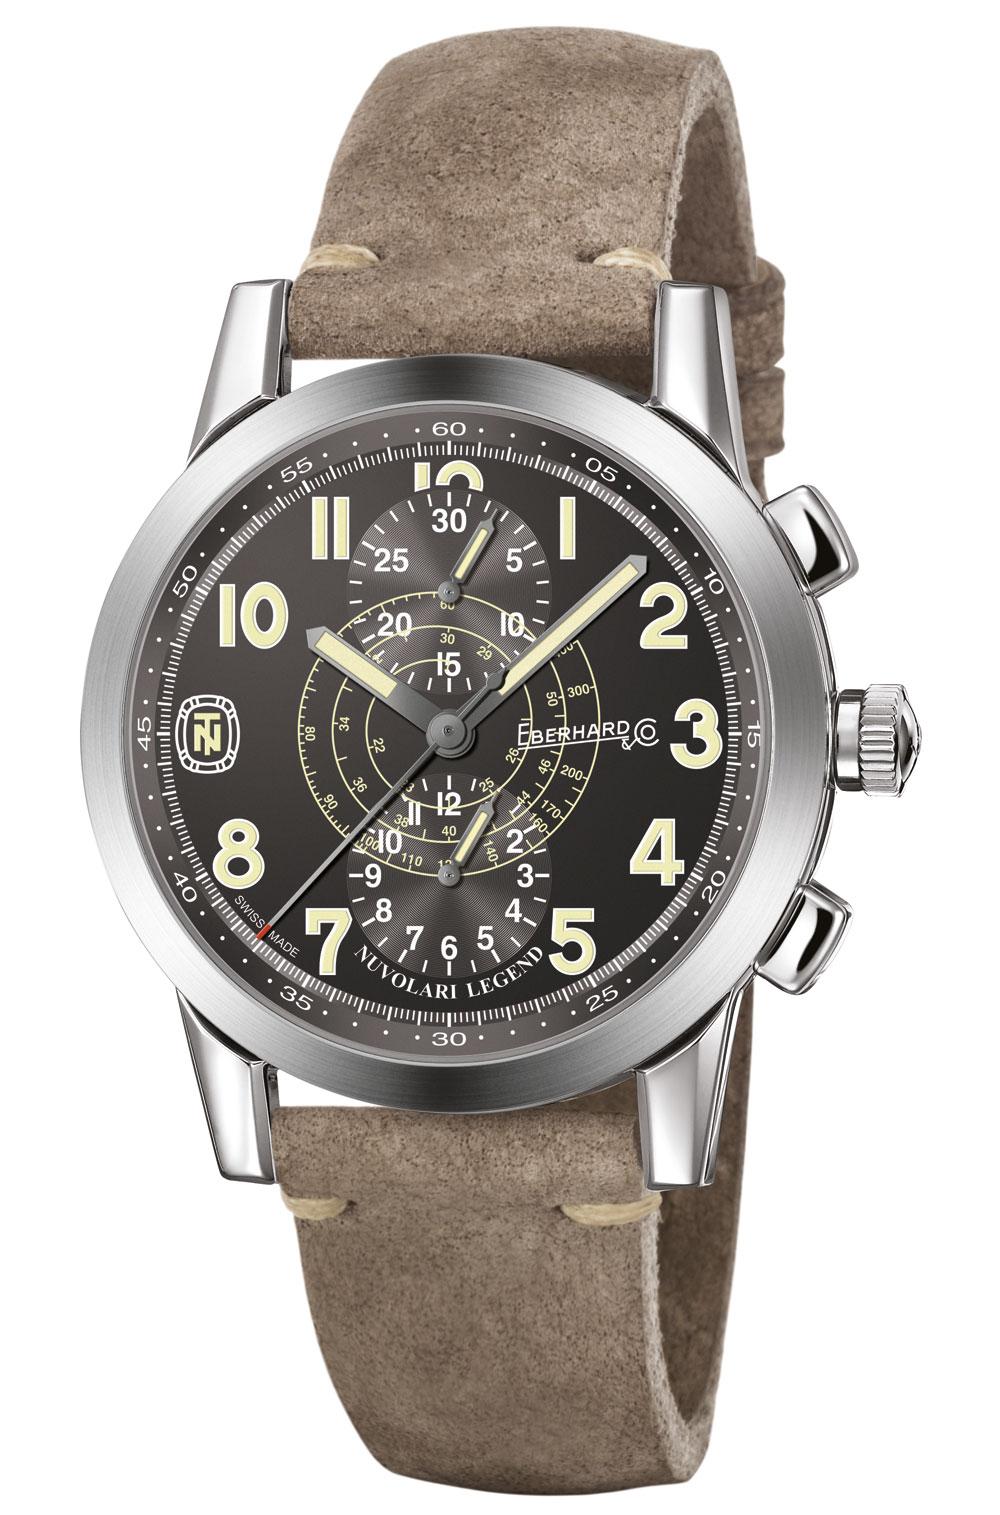 Reloj Eberhard & Co Nuvolari Legend